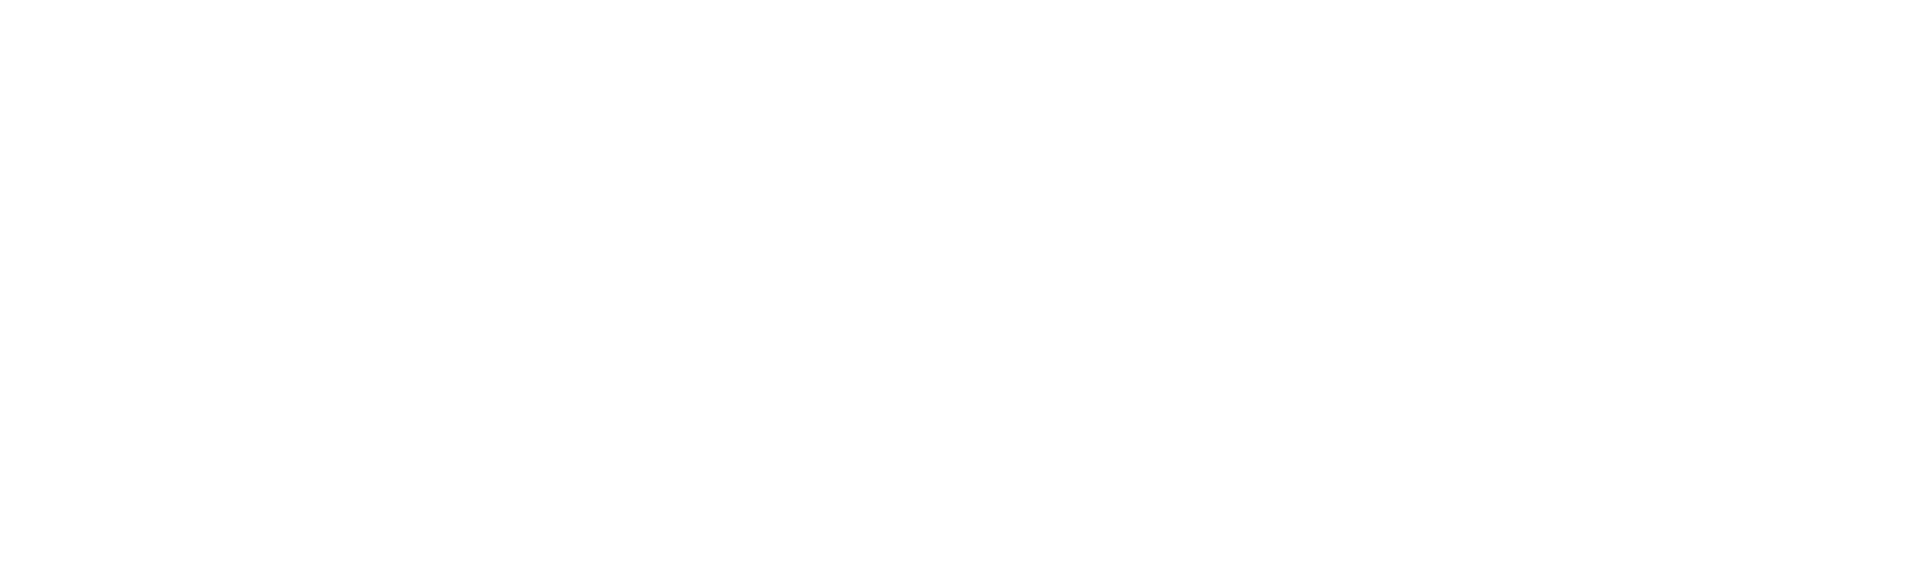 Online-Shop der Schülerzeitung SCHULZ am Gotthold-Ephraim-Lessing-Gymnasium Kamenz - Lessgym Kamenz-Logo